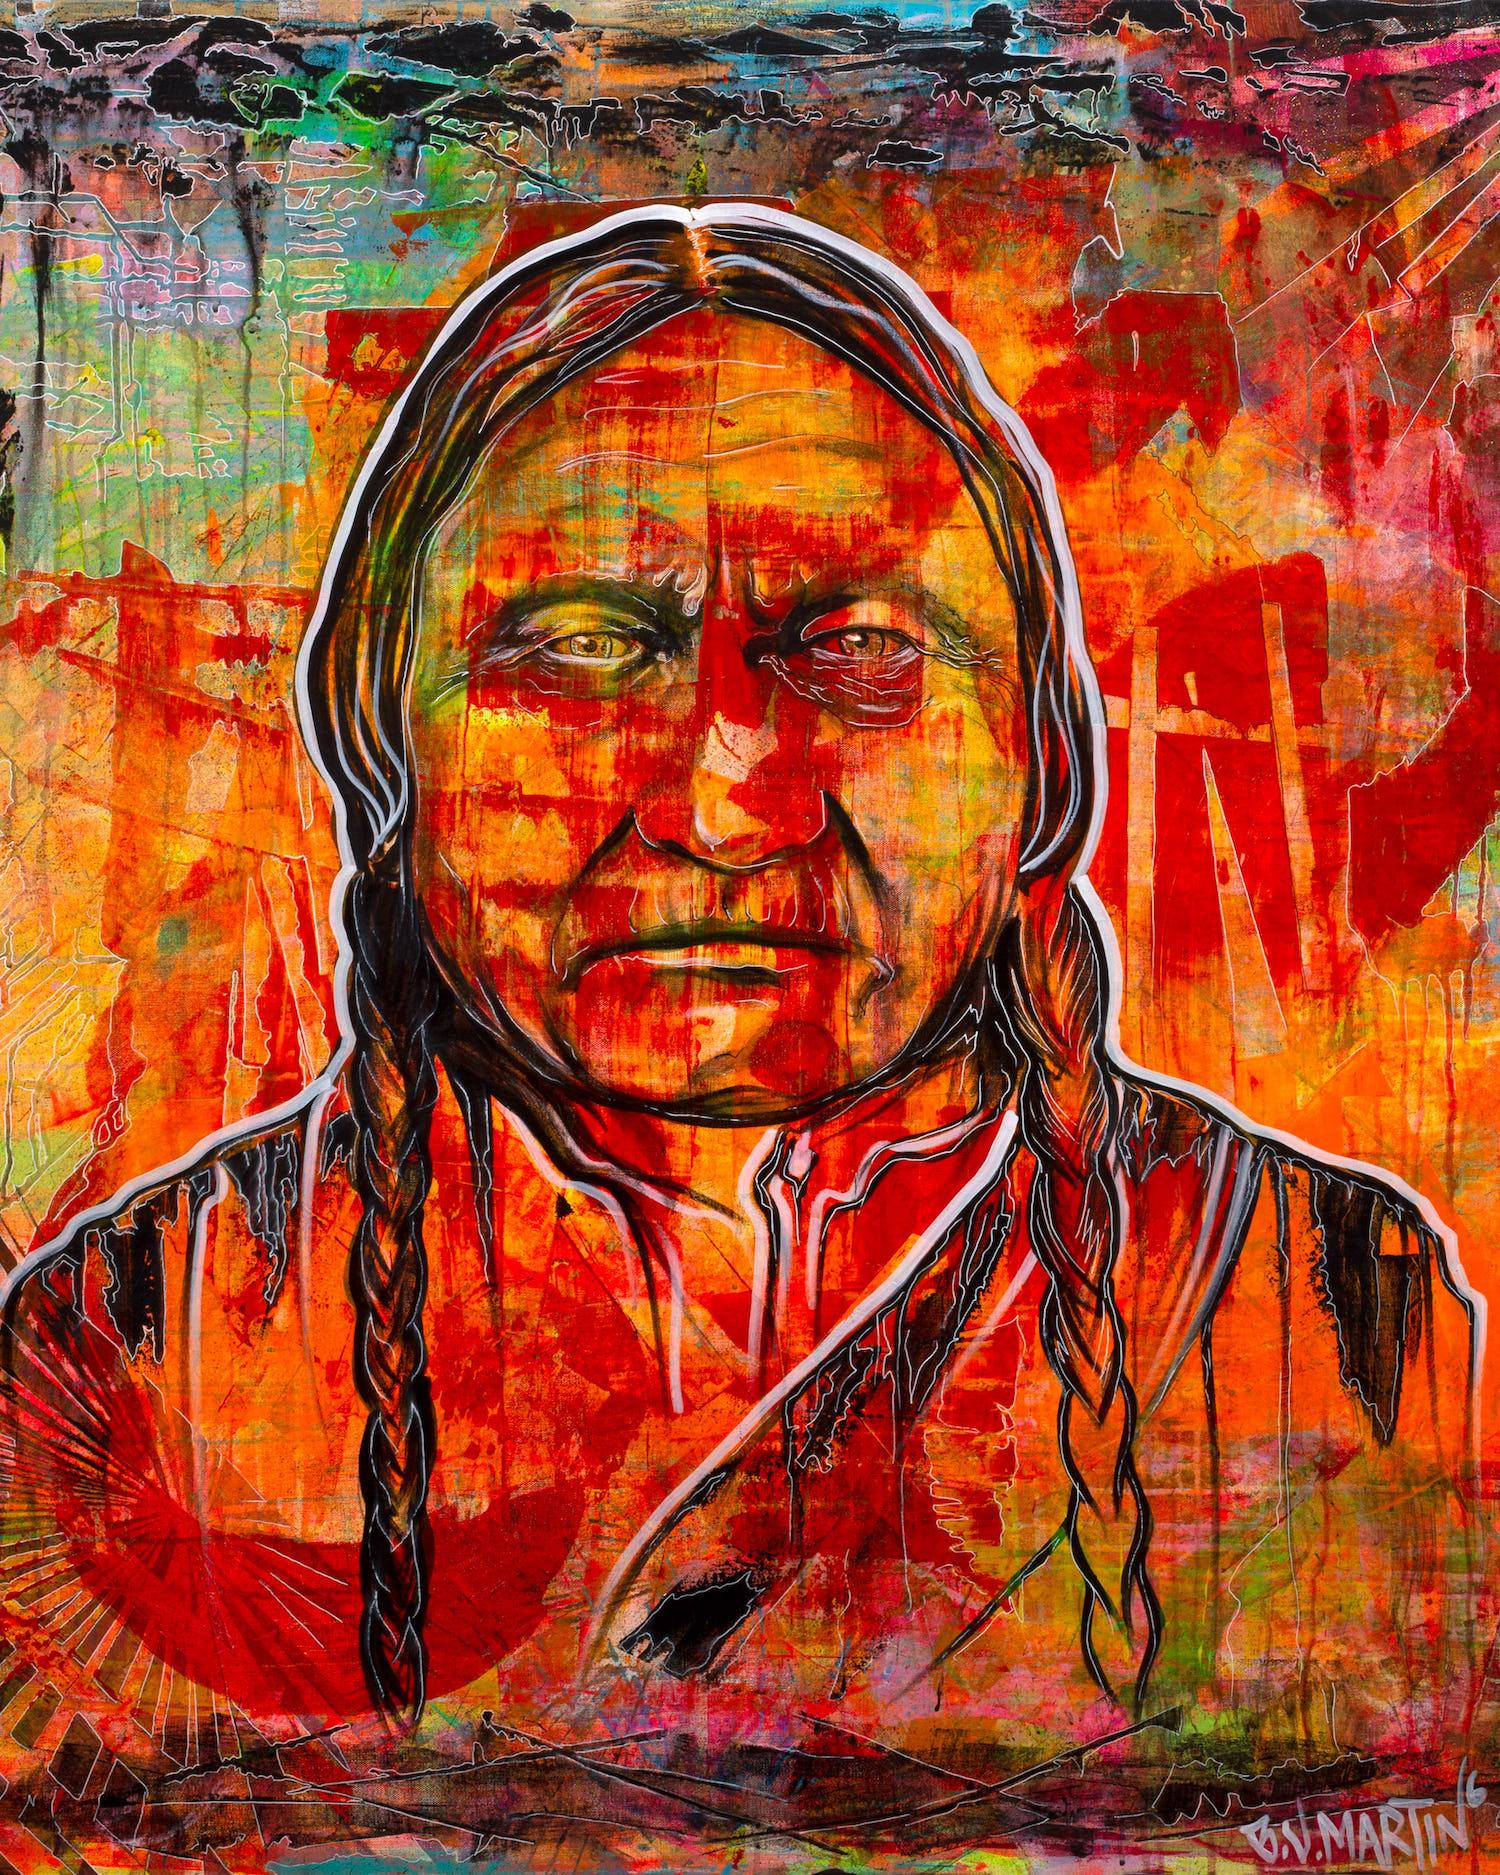 Fresno Calif. Art Photography  - Photo of Indian Art Painting